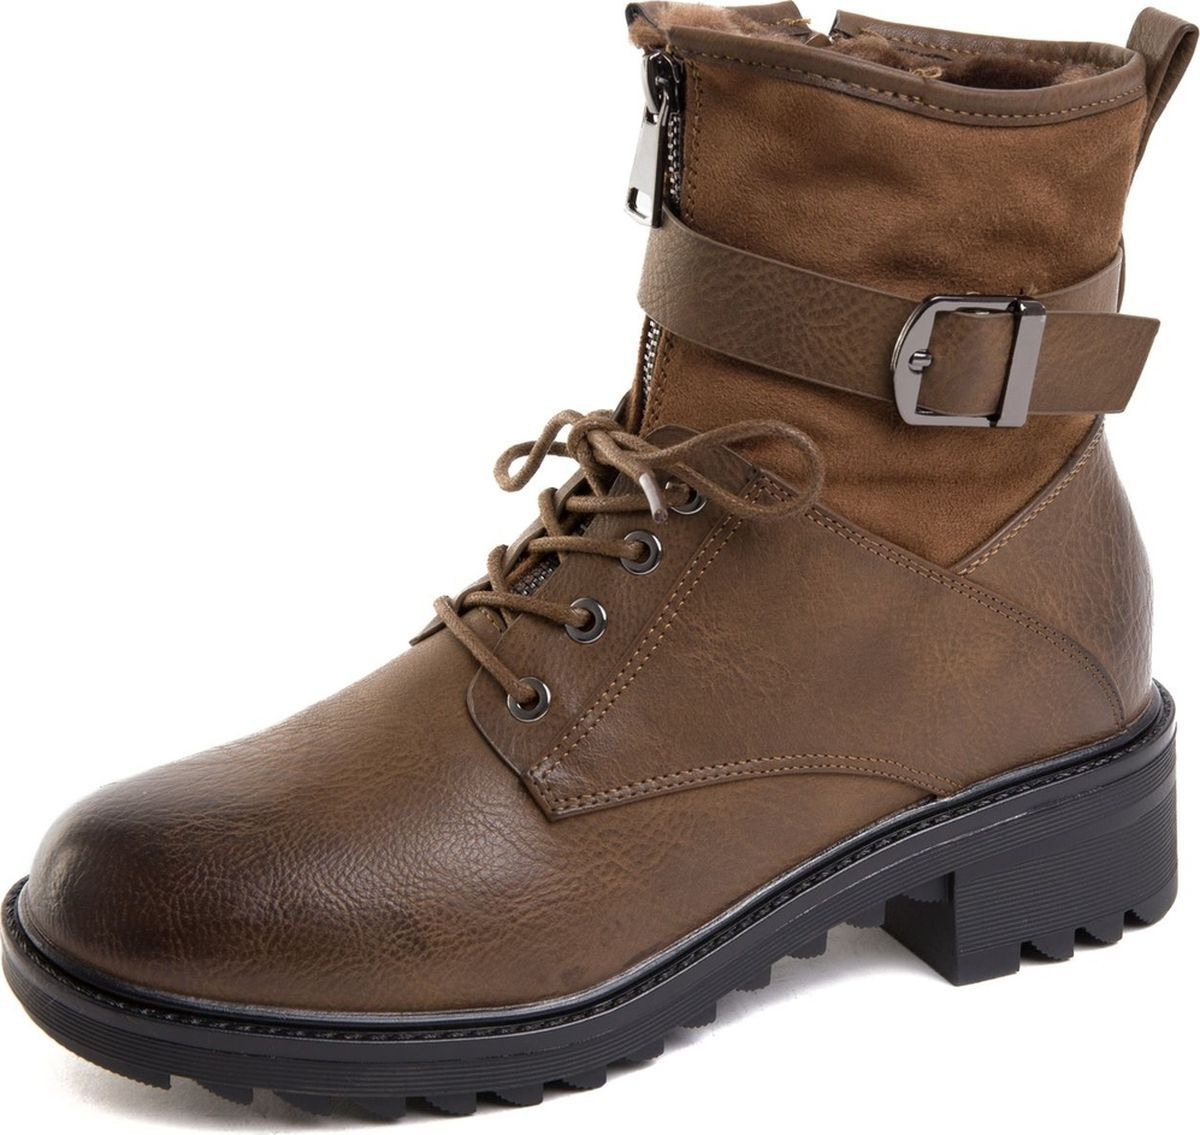 Ботинки Purlina ботинки женские purlina цвет темно синий b8270 5 размер 36